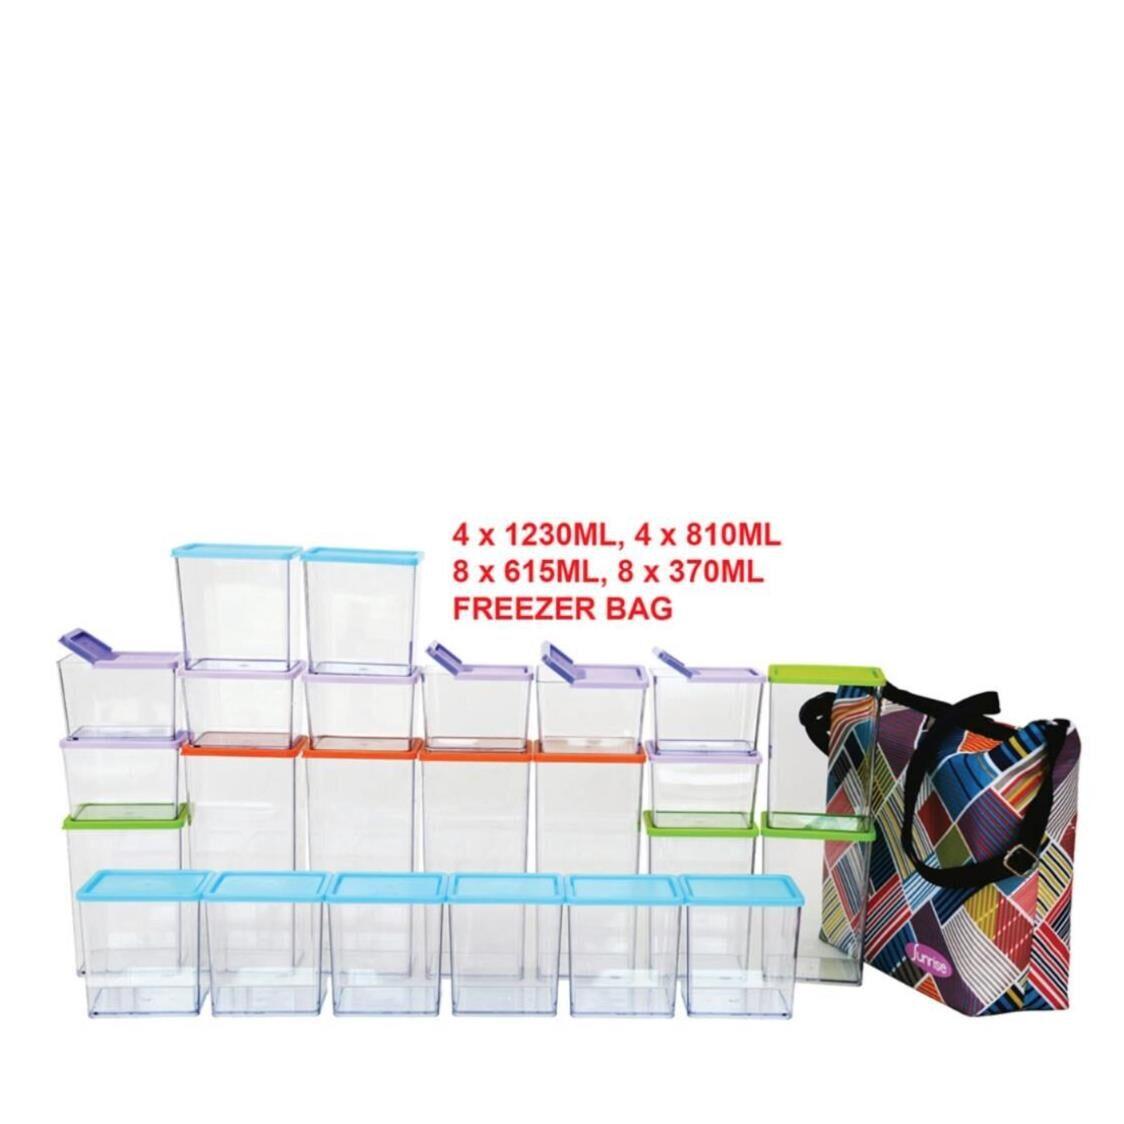 Sunrise 48pc Stackable Kitchen Organizer Set  Freezer Bag Made In Korea SPB-49